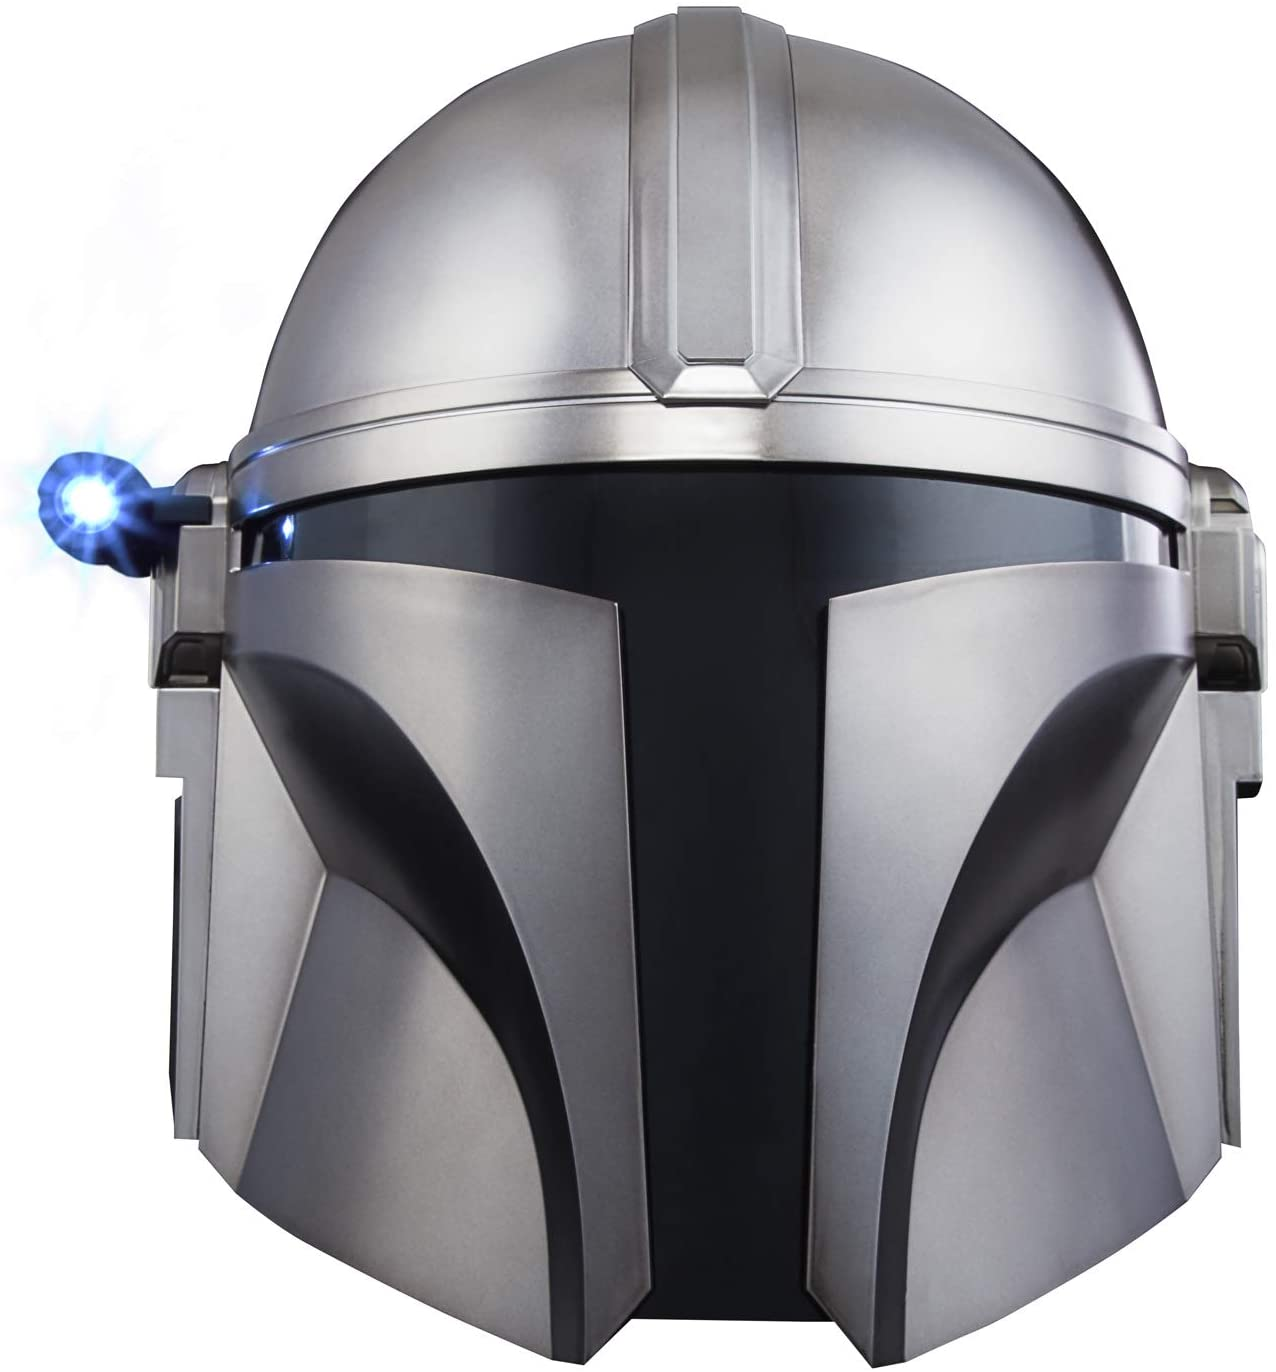 Star Wars The Black Series Premium Mandalorian Electronic Helmet